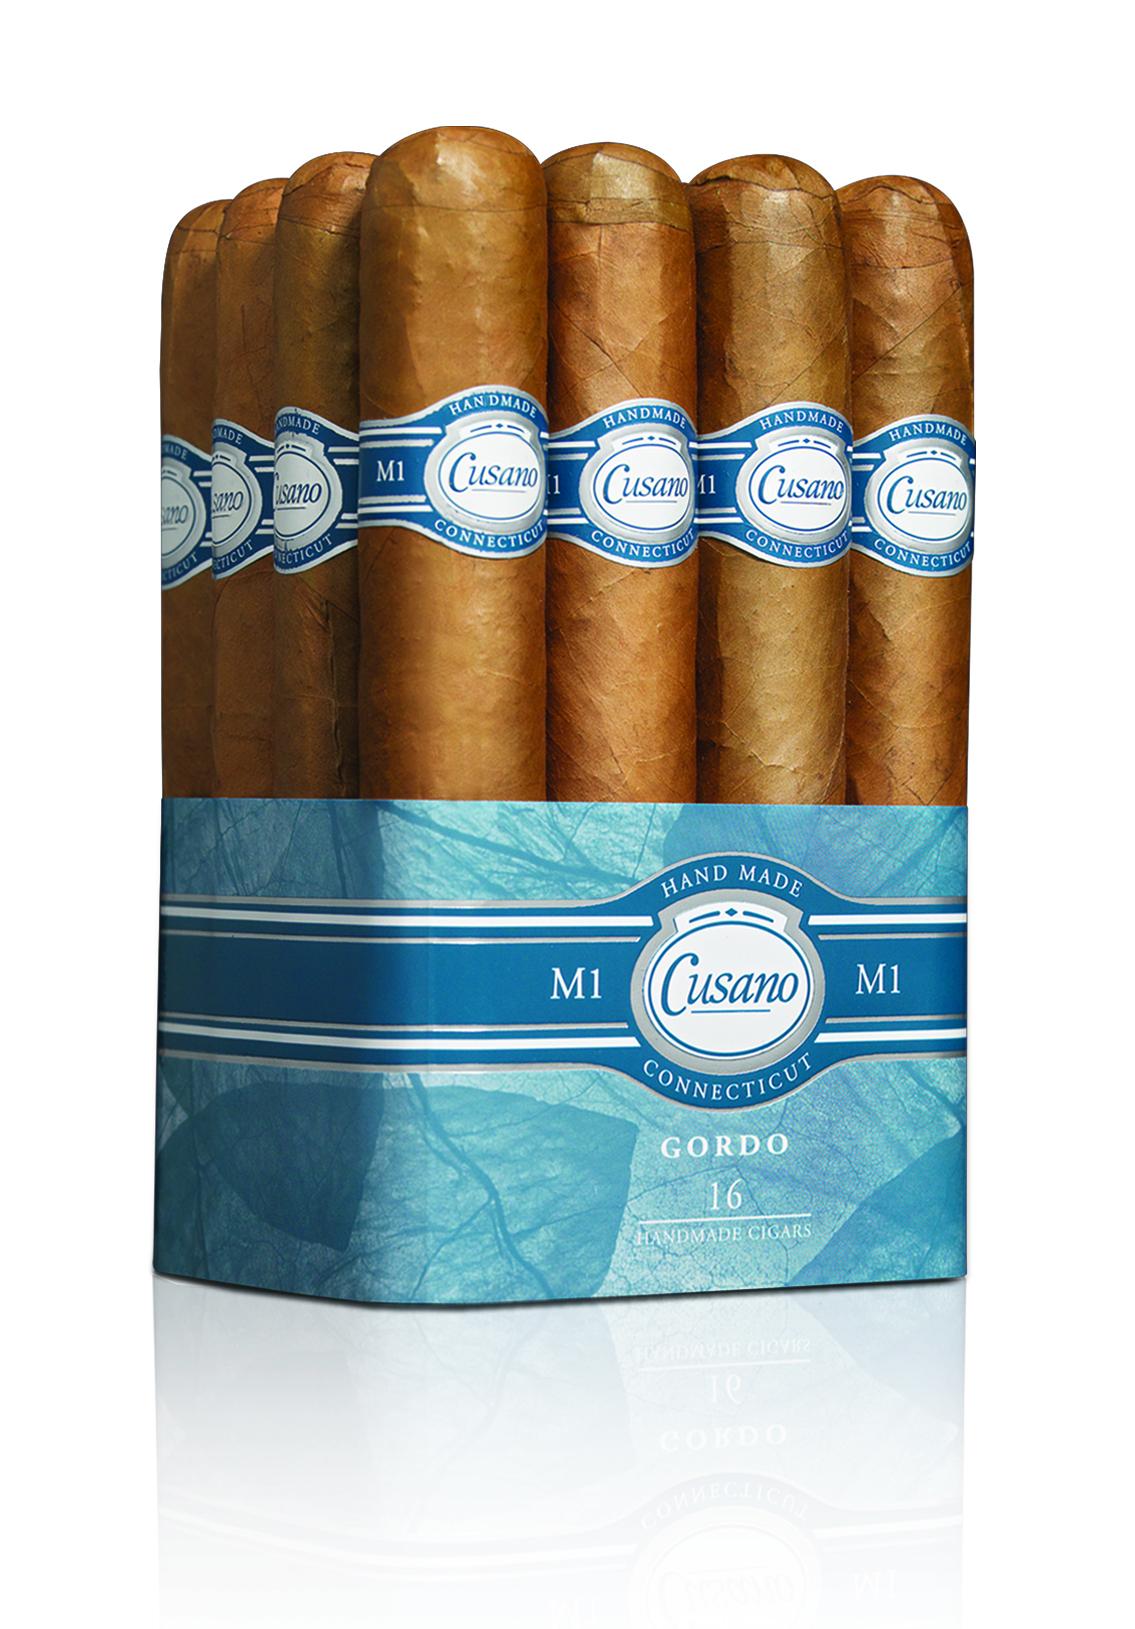 Cusano M1 Connecticut cigar bundle